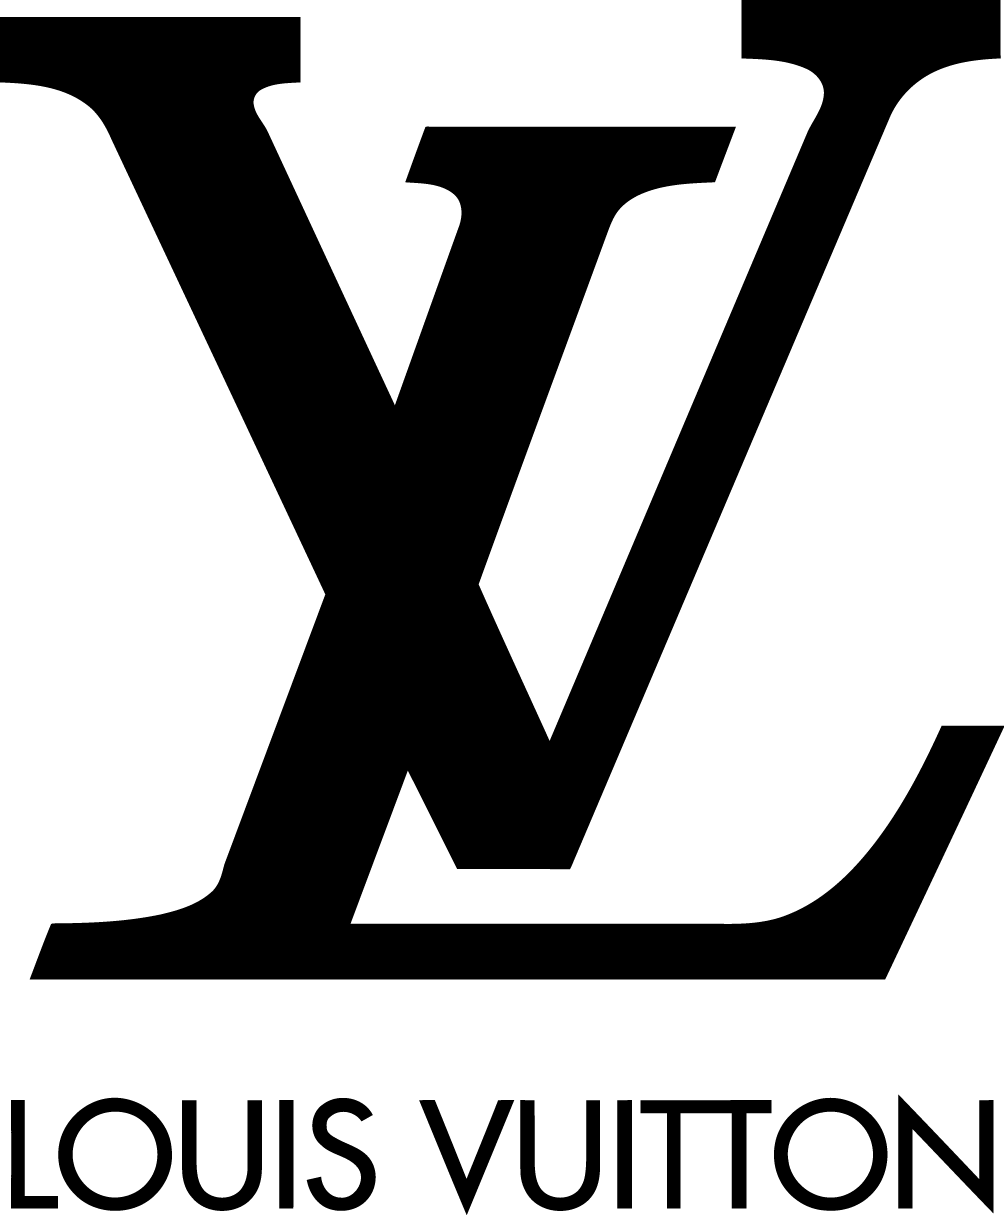 Louis Vuitton clipart famous fashion Stencil Logo Ideas Vuitton and